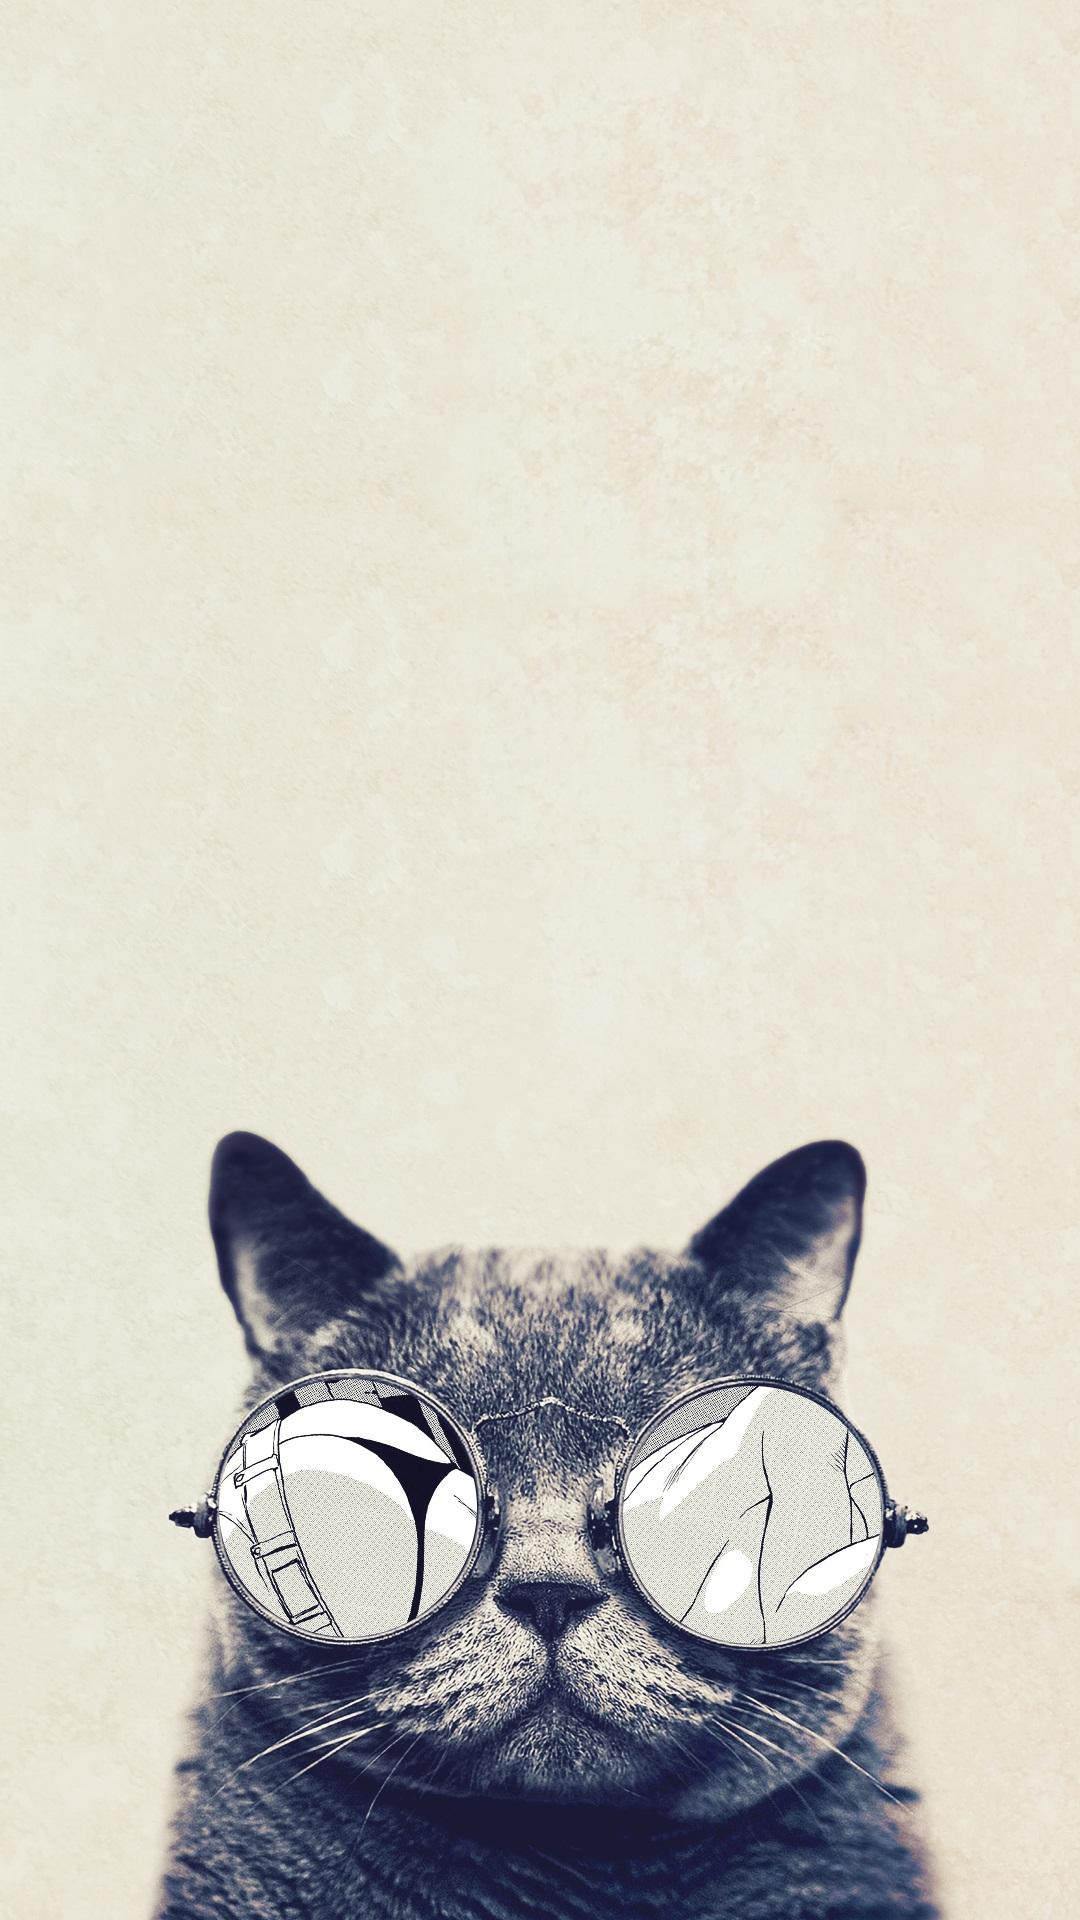 iPhone 6s Cool Cat Wallpaper HD iPhones Wallpapers 1080x1920